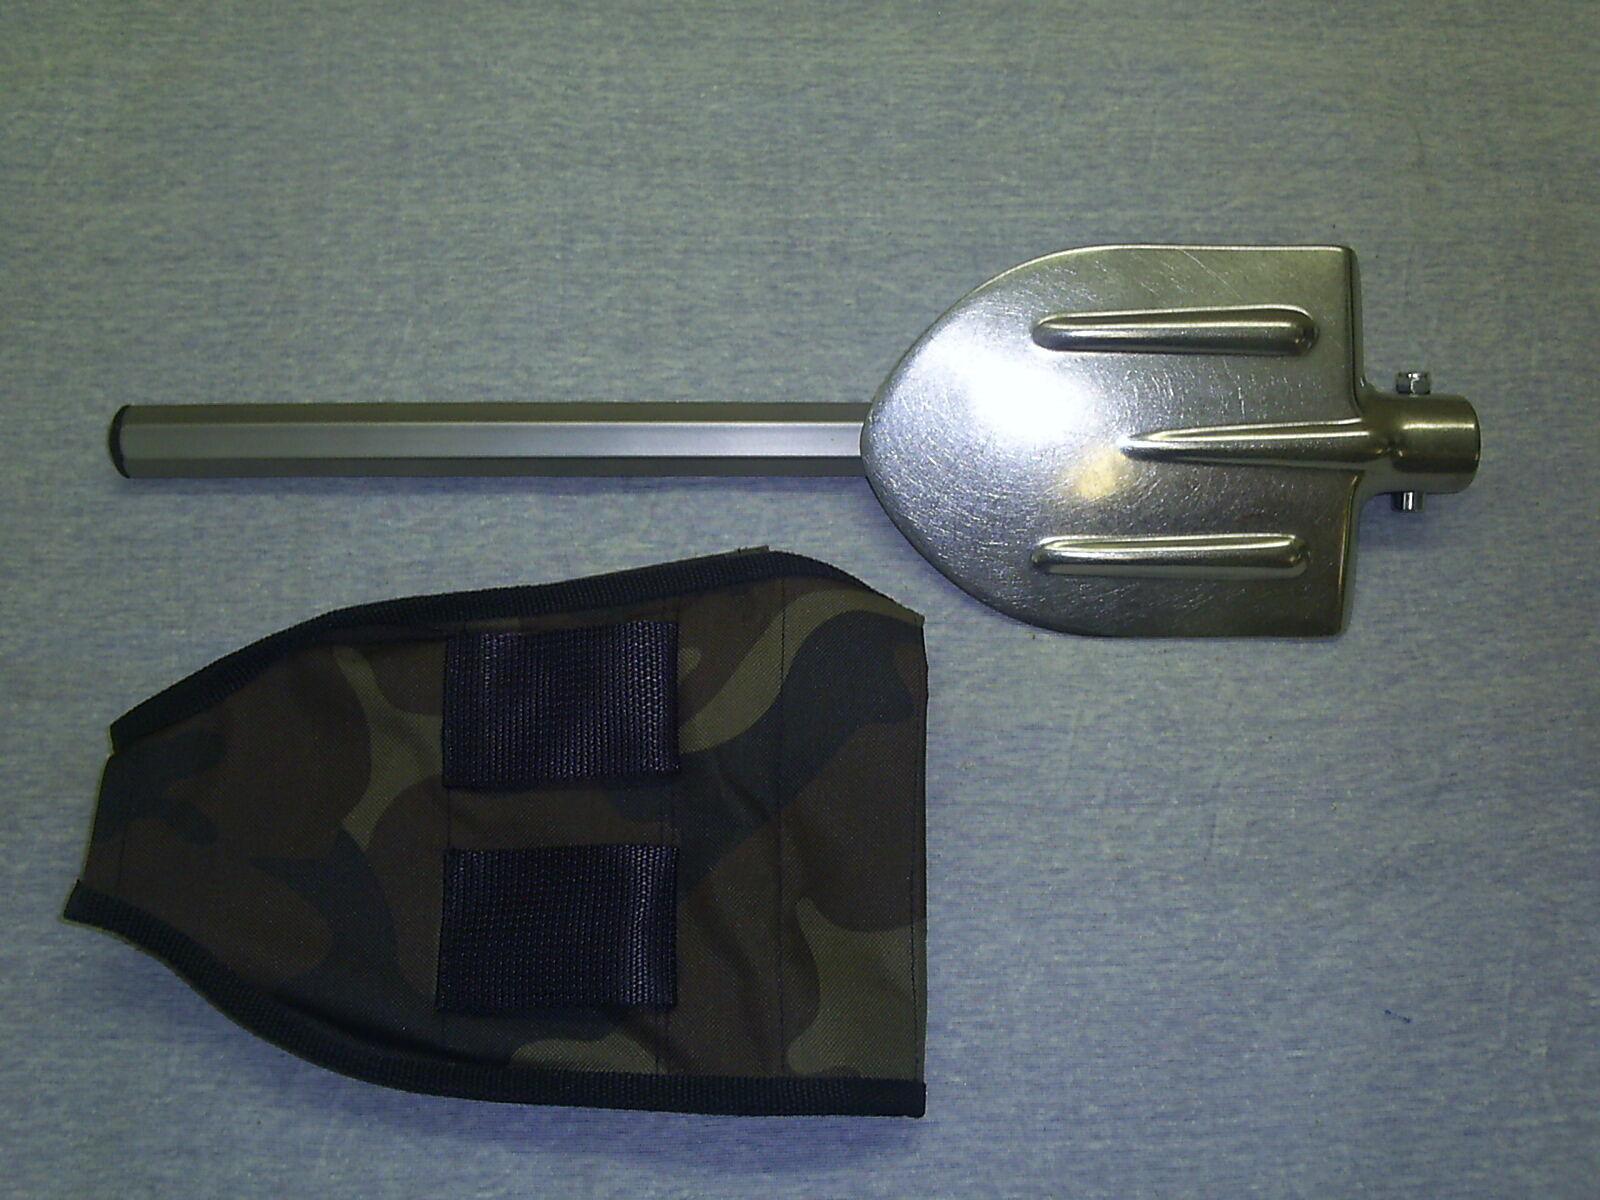 Shovel Folding Camping Survival Military Titanium Fullmetal Tool +POUCH +POUCH Tool 723d88